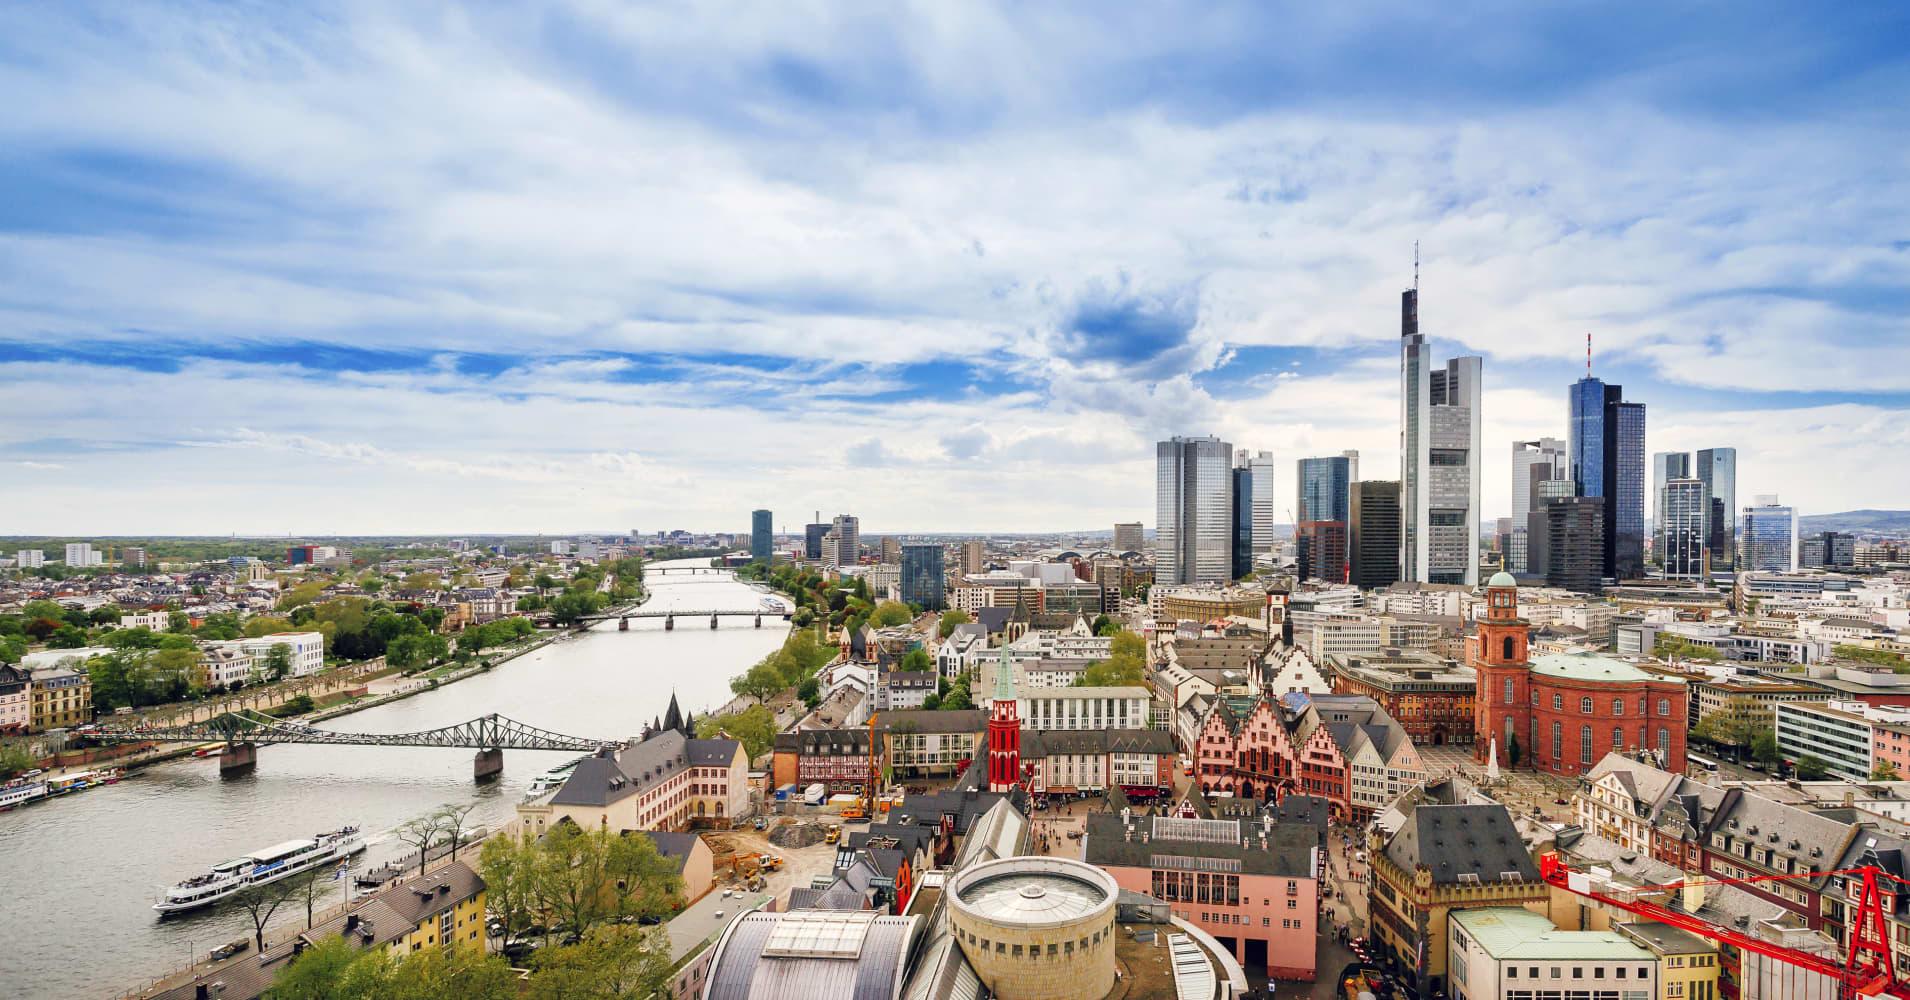 Frankfurt skyline and Romerberg City Hall Square in the German city of Frankfurt.